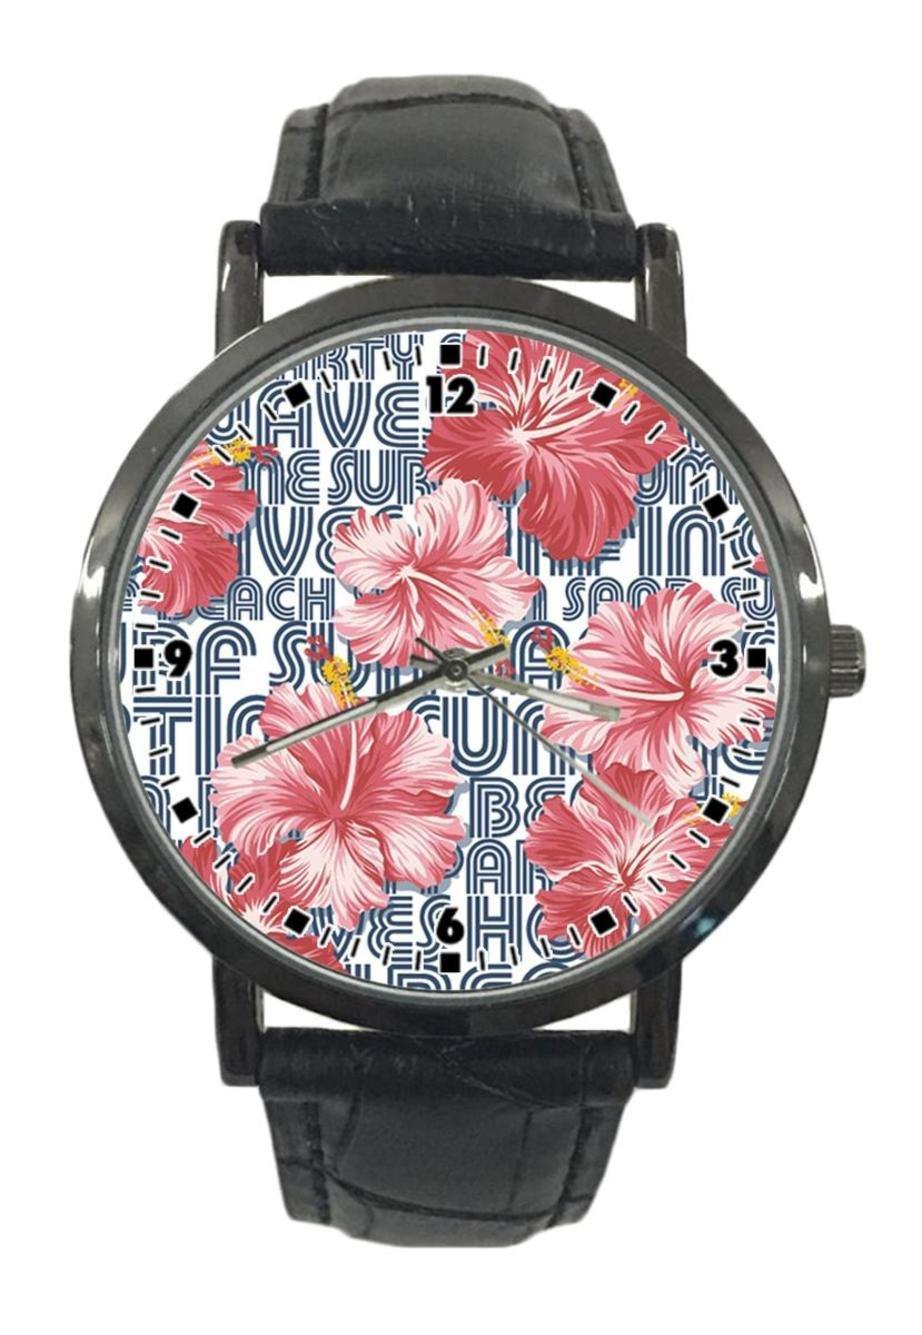 jkfgweeryhrt New Simple Fashion Tropical Flowers Stainless Steel Leather Analog Quartz Sport Wrist Watch